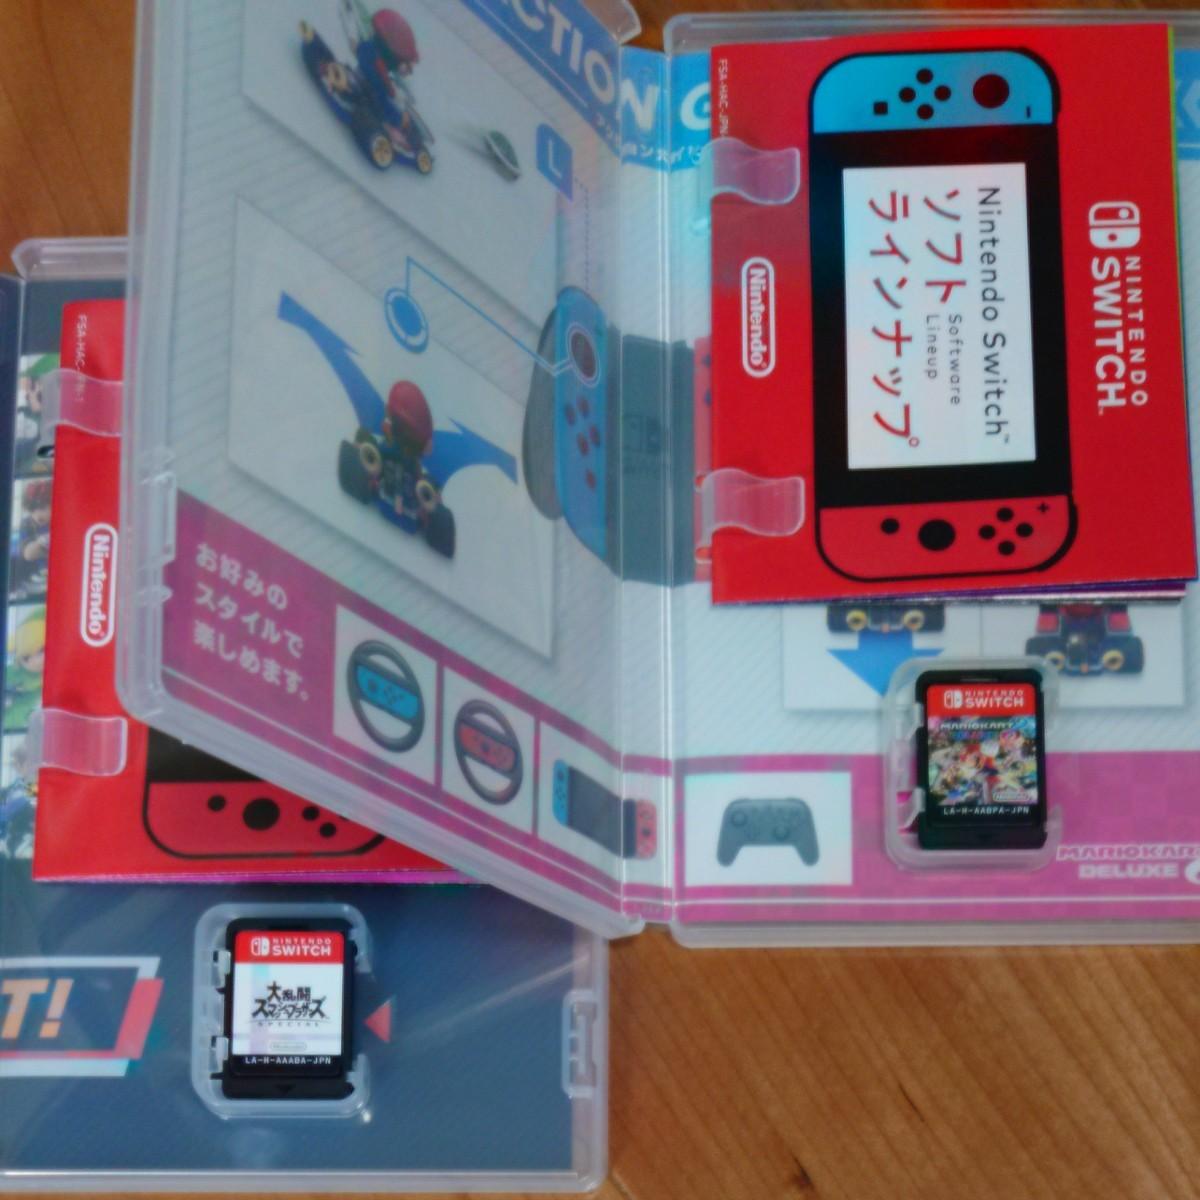 Nintendo Switch 大乱闘スマッシュブラザーズ マリオカート8デラックス セット